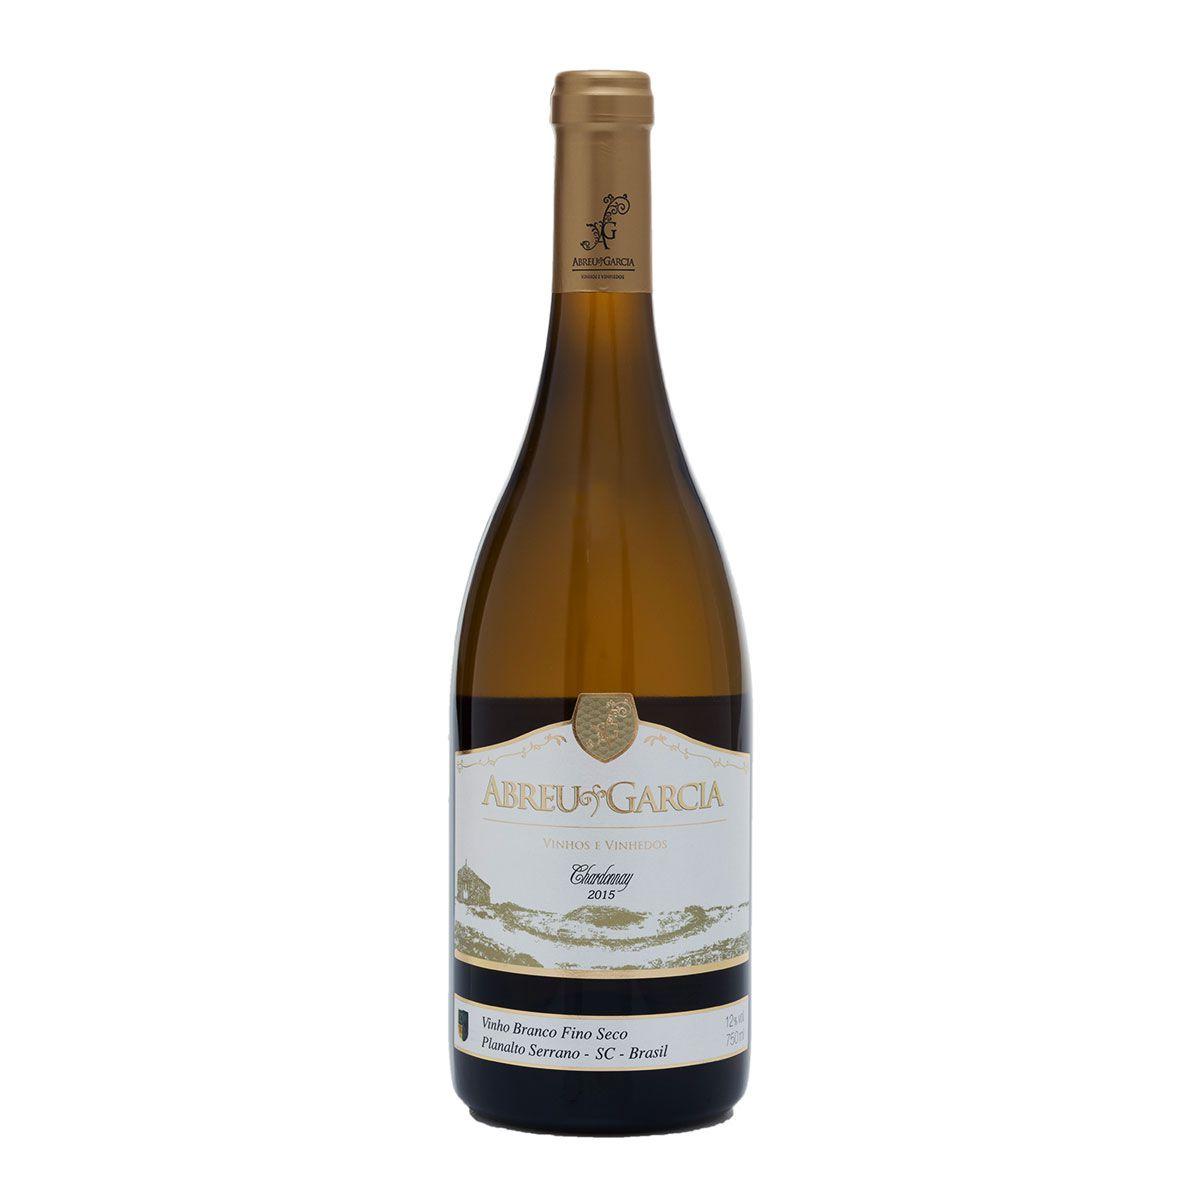 Vinho Fino Branco Seco Abreu Garcia Chardonnay 2017 750ml